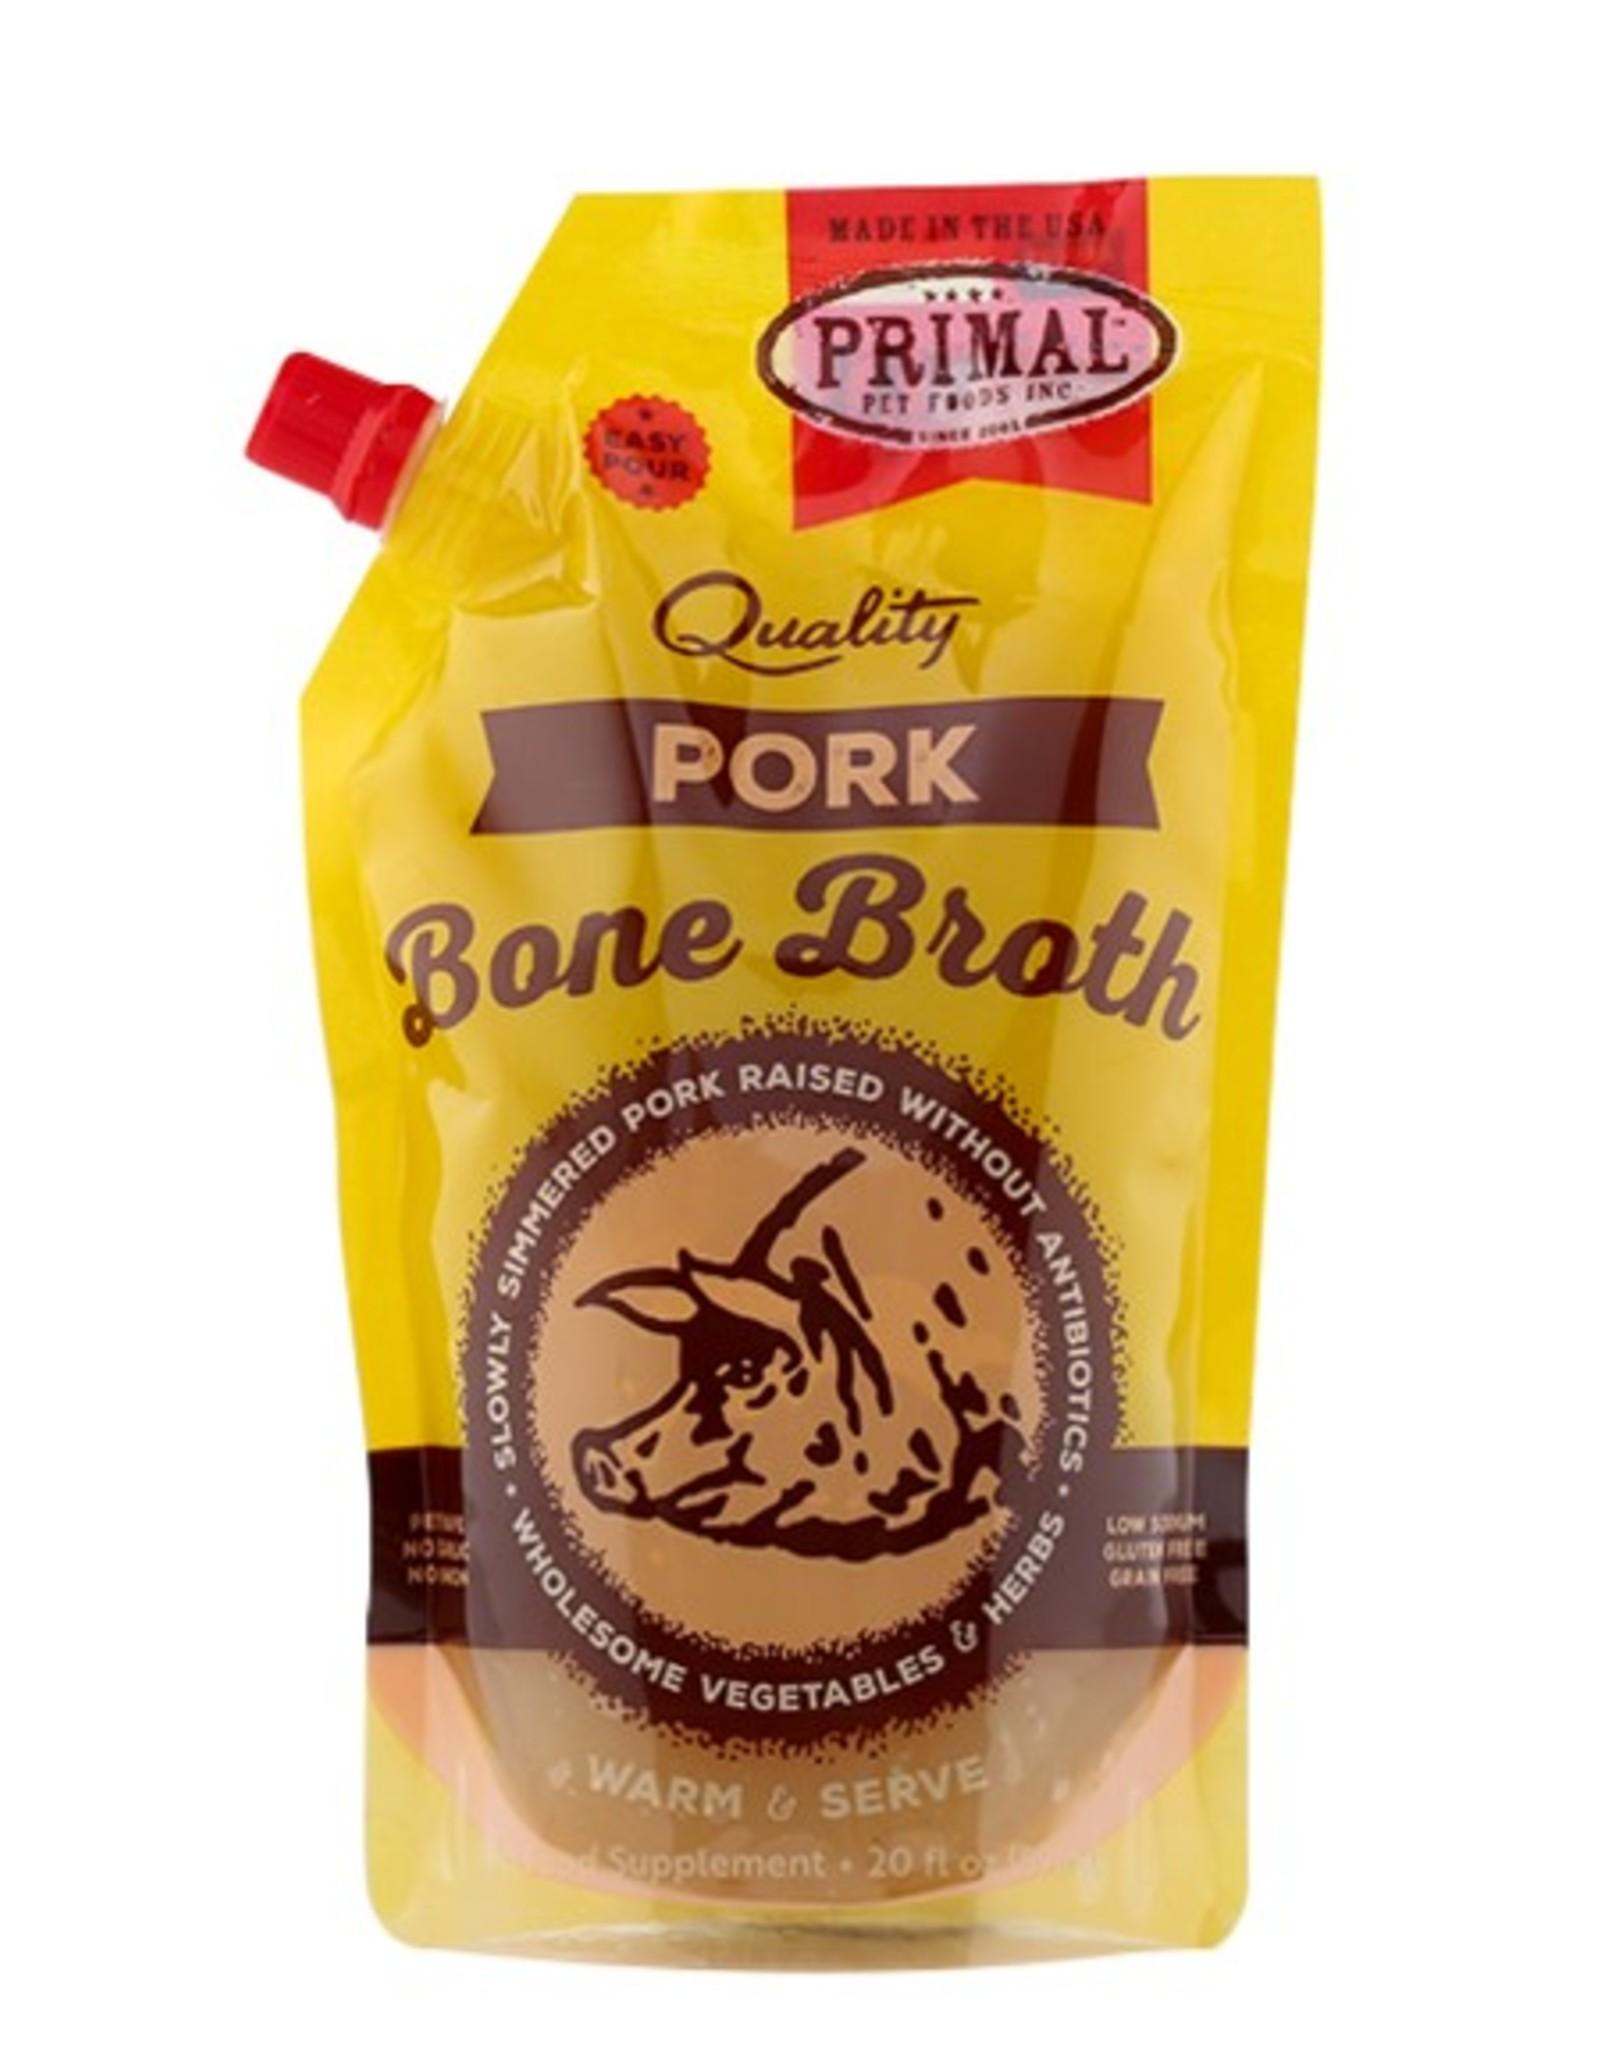 Primal Pet Food Primal Frozen Pork Bone Broth 20oz